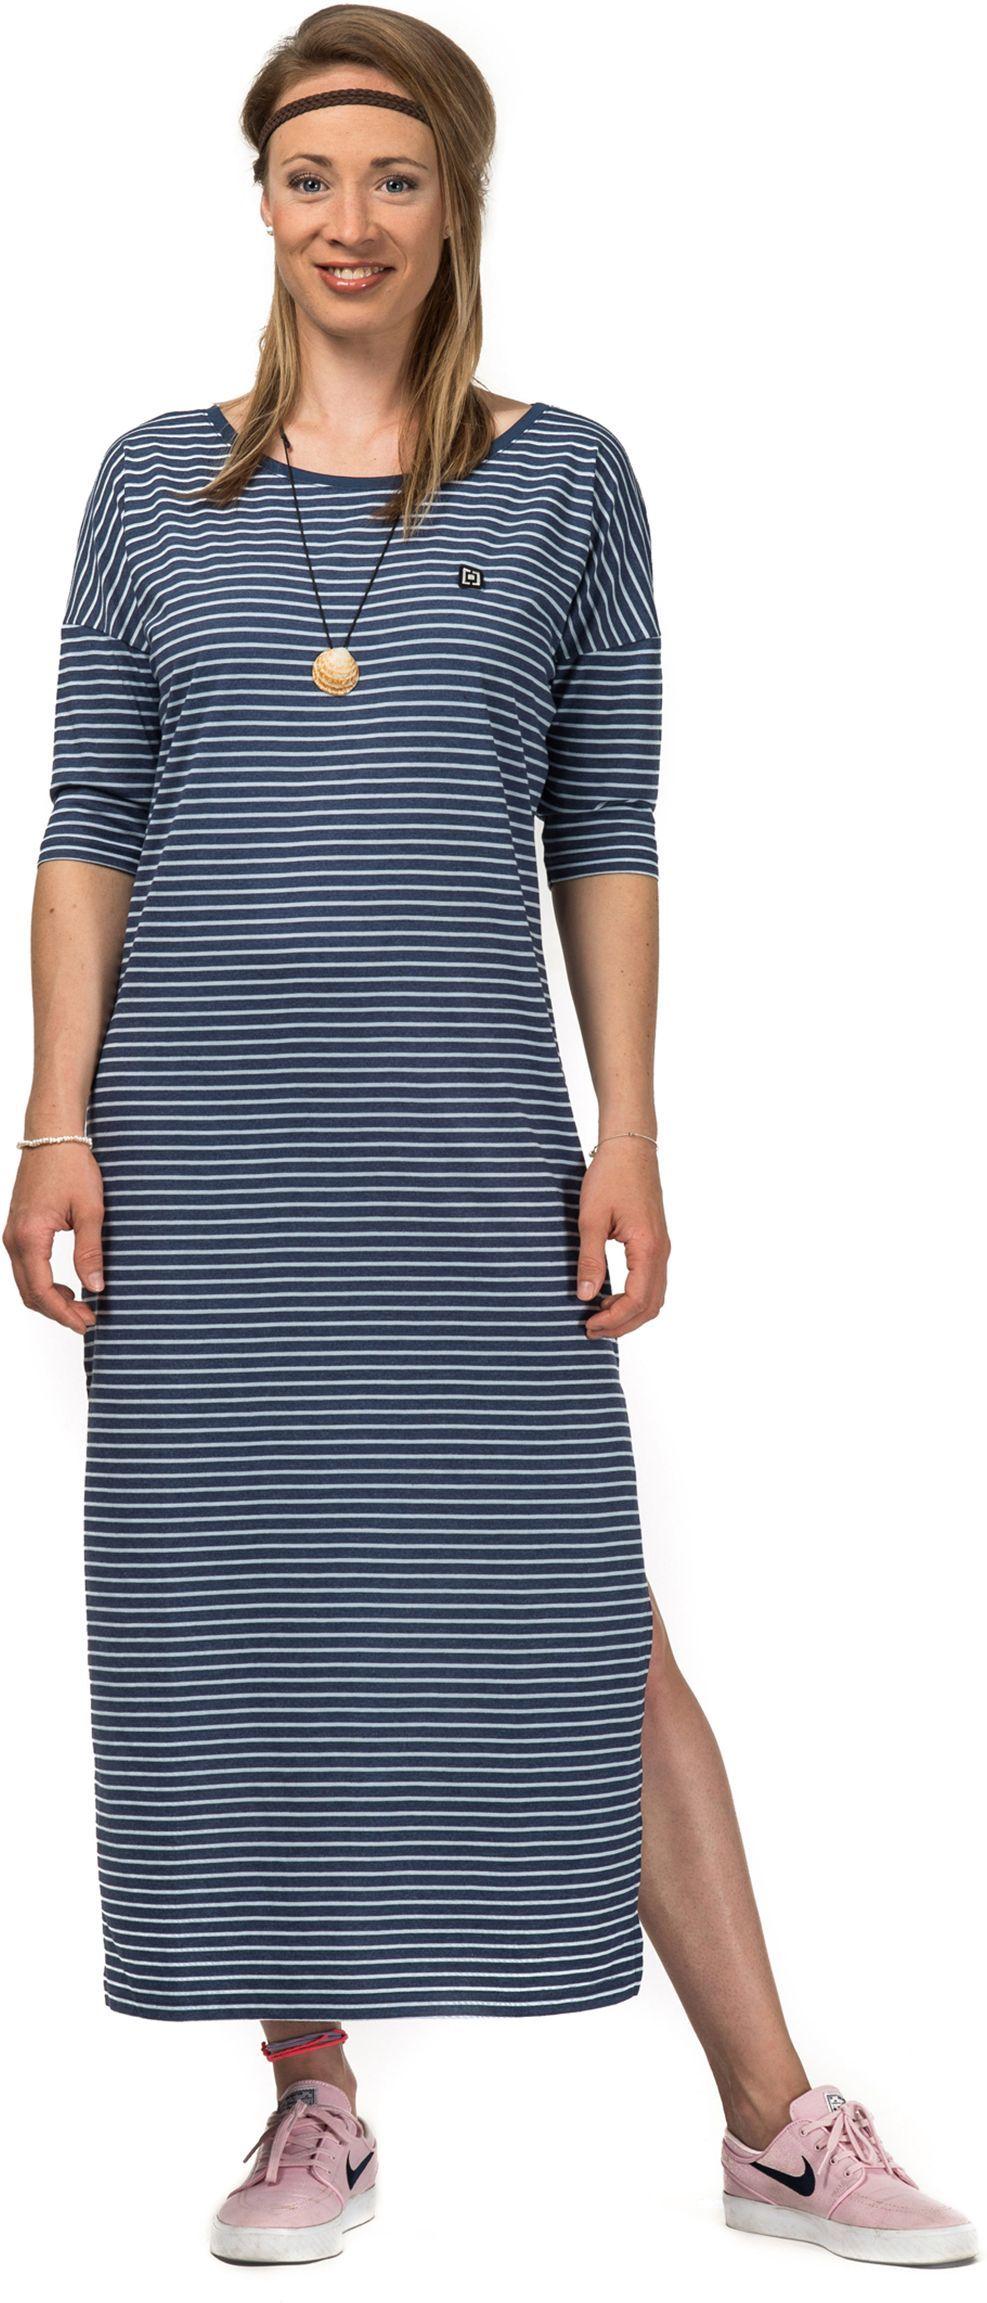 sukienka damska HORSEFEATHERS LILLIAN DRESS (navy stripes)